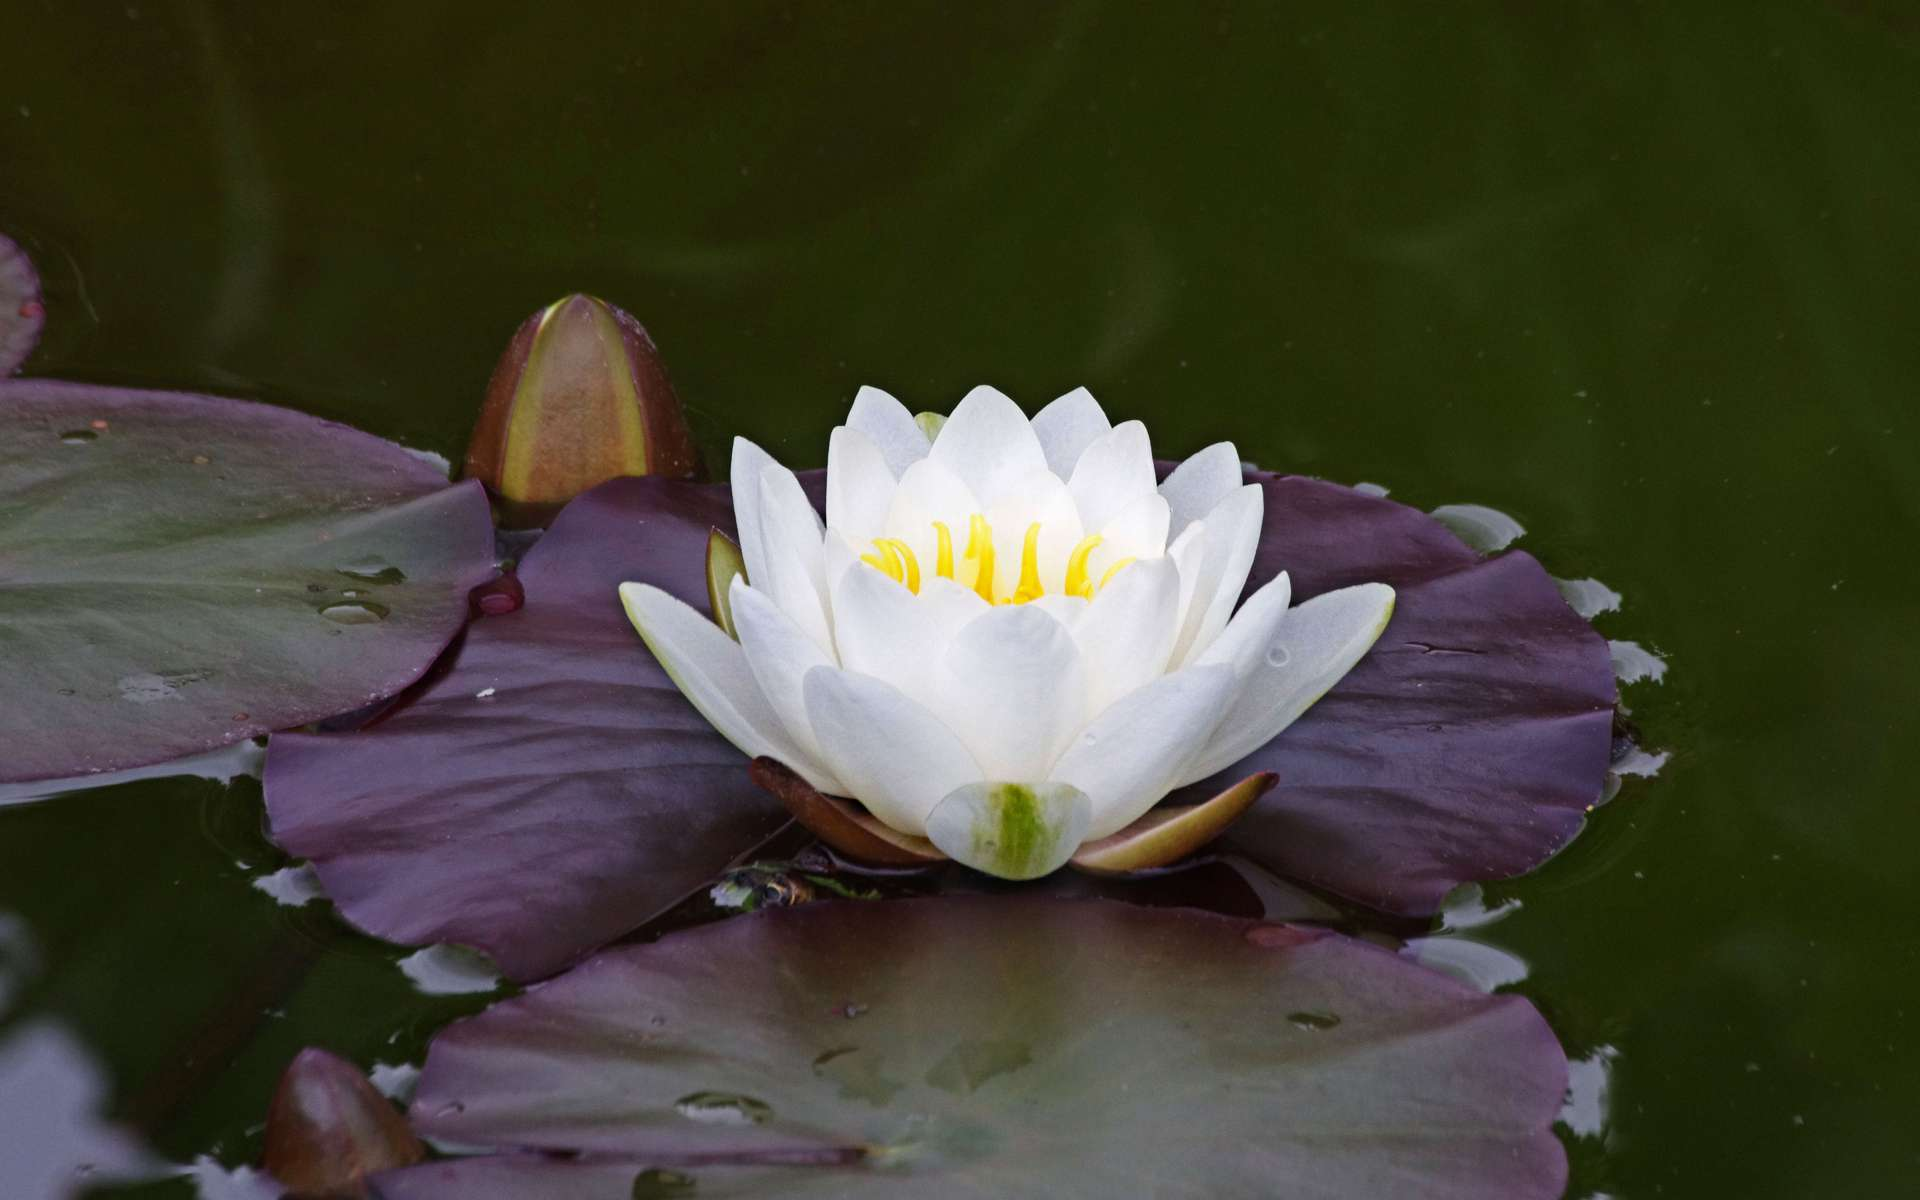 Nénuphar blanc (Crédits : Daniel Jolivet - flickr)